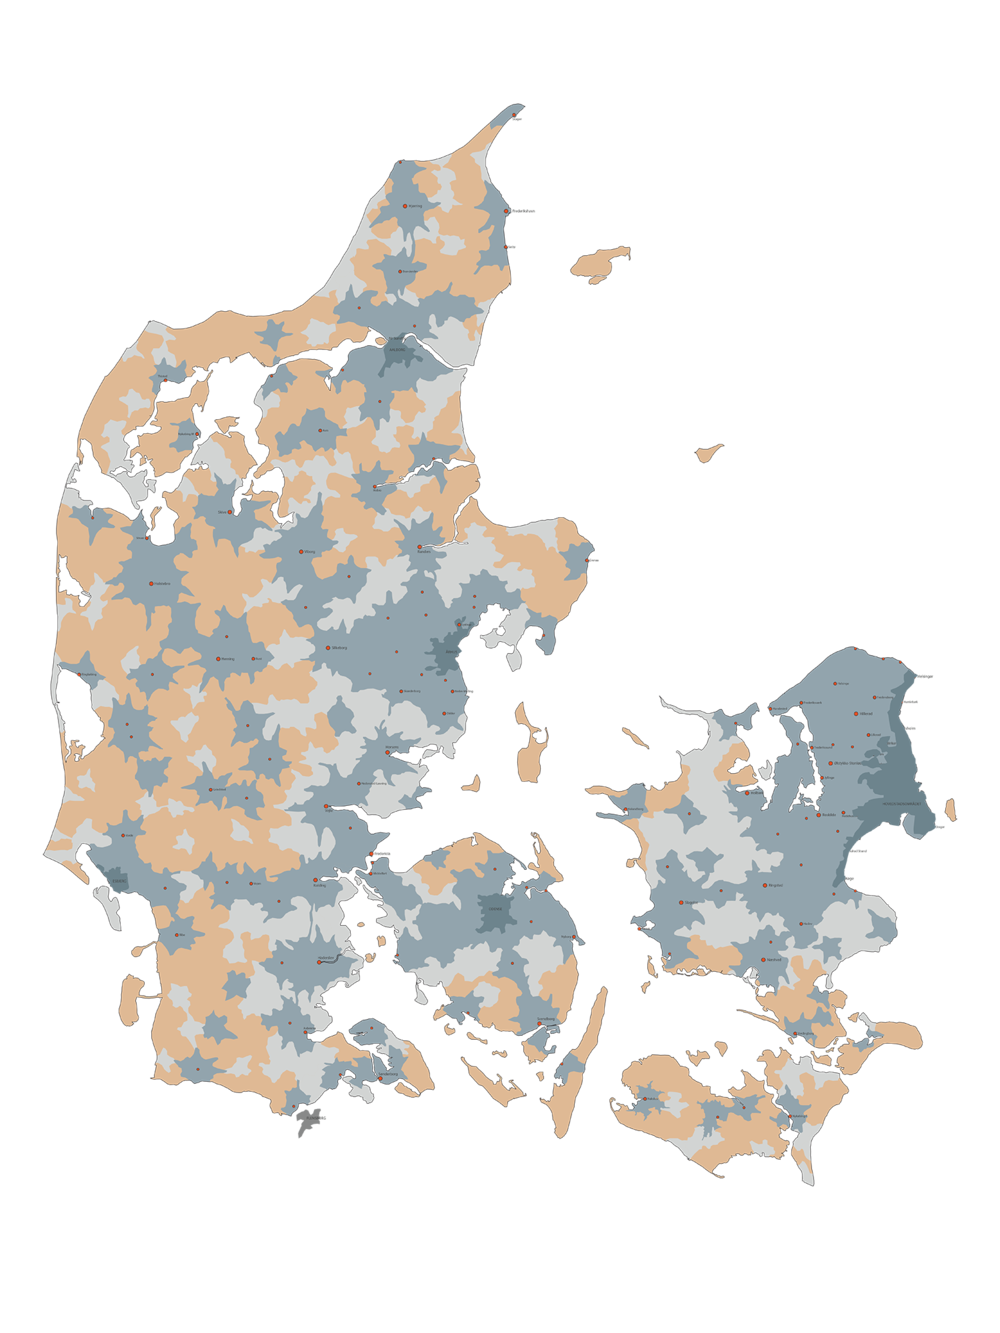 Urland Affolkning i Danmark